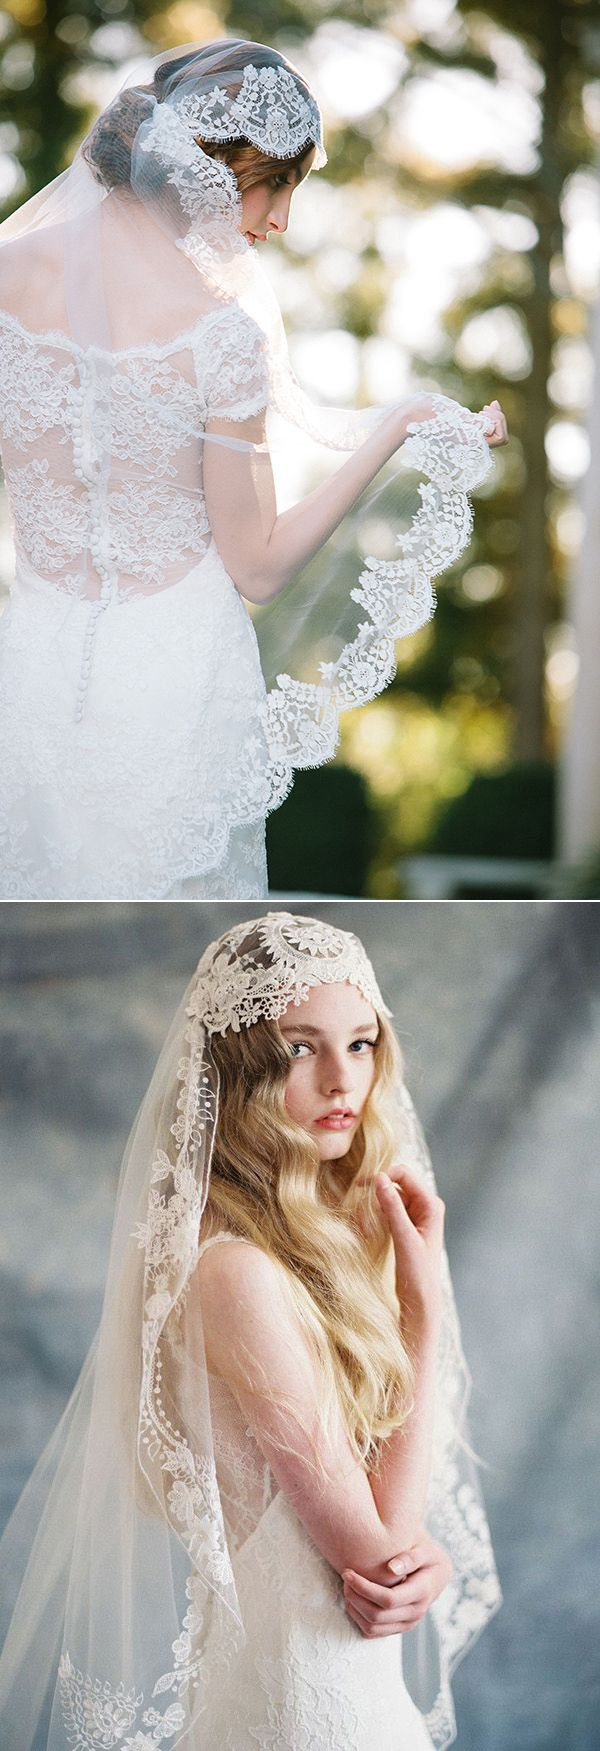 gorgeous cap style wedding veils